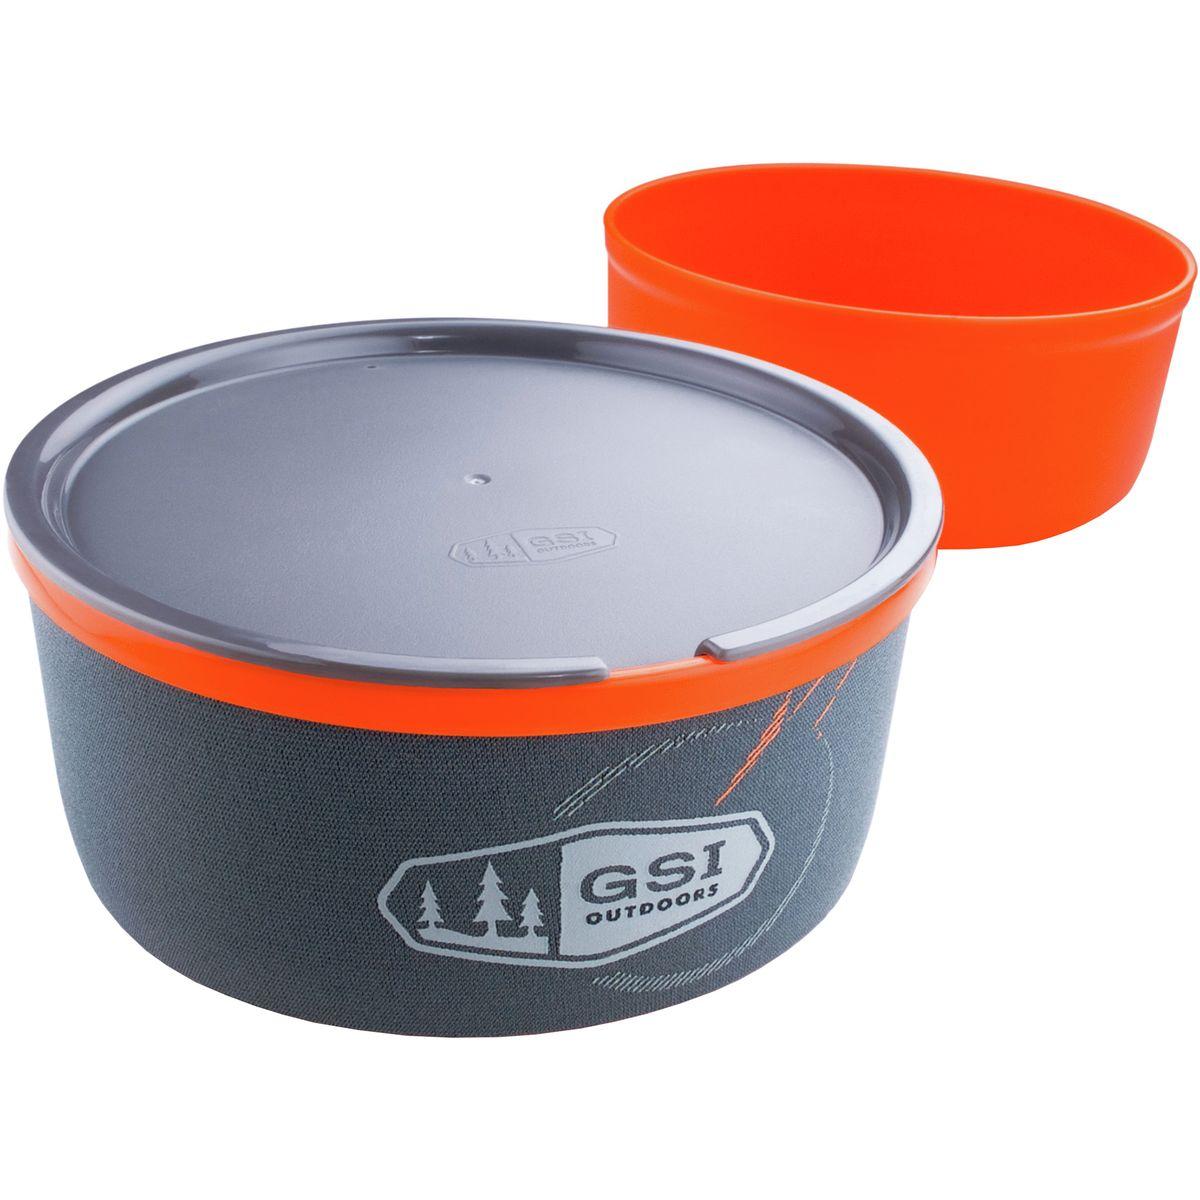 GSI Outdoors Ultralight Nesting Bowl and Mug